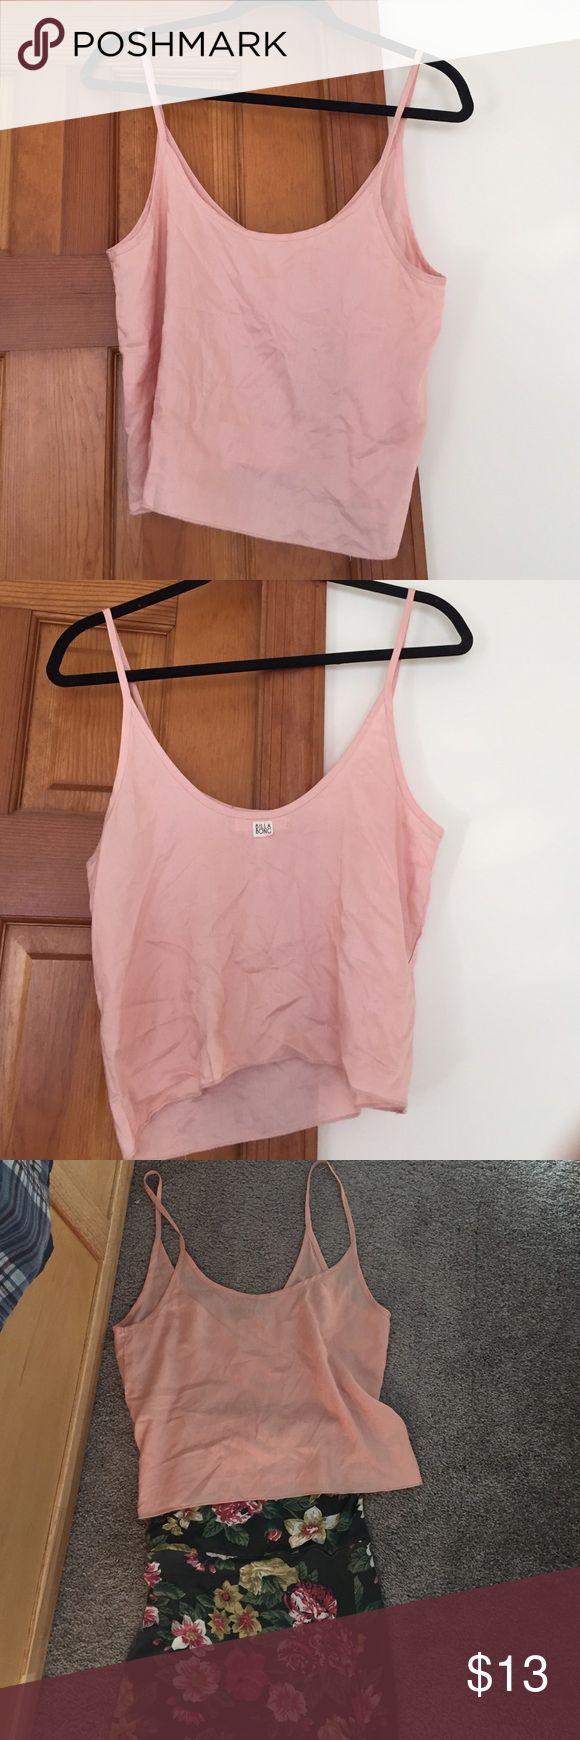 Powder Pink billabong crop top Cute little linen billabong crop top! Goes PERFECT with this rose Maxi skirt (also sold in my closet) bundle for an amazing outfit! Billabong Tops Tank Tops